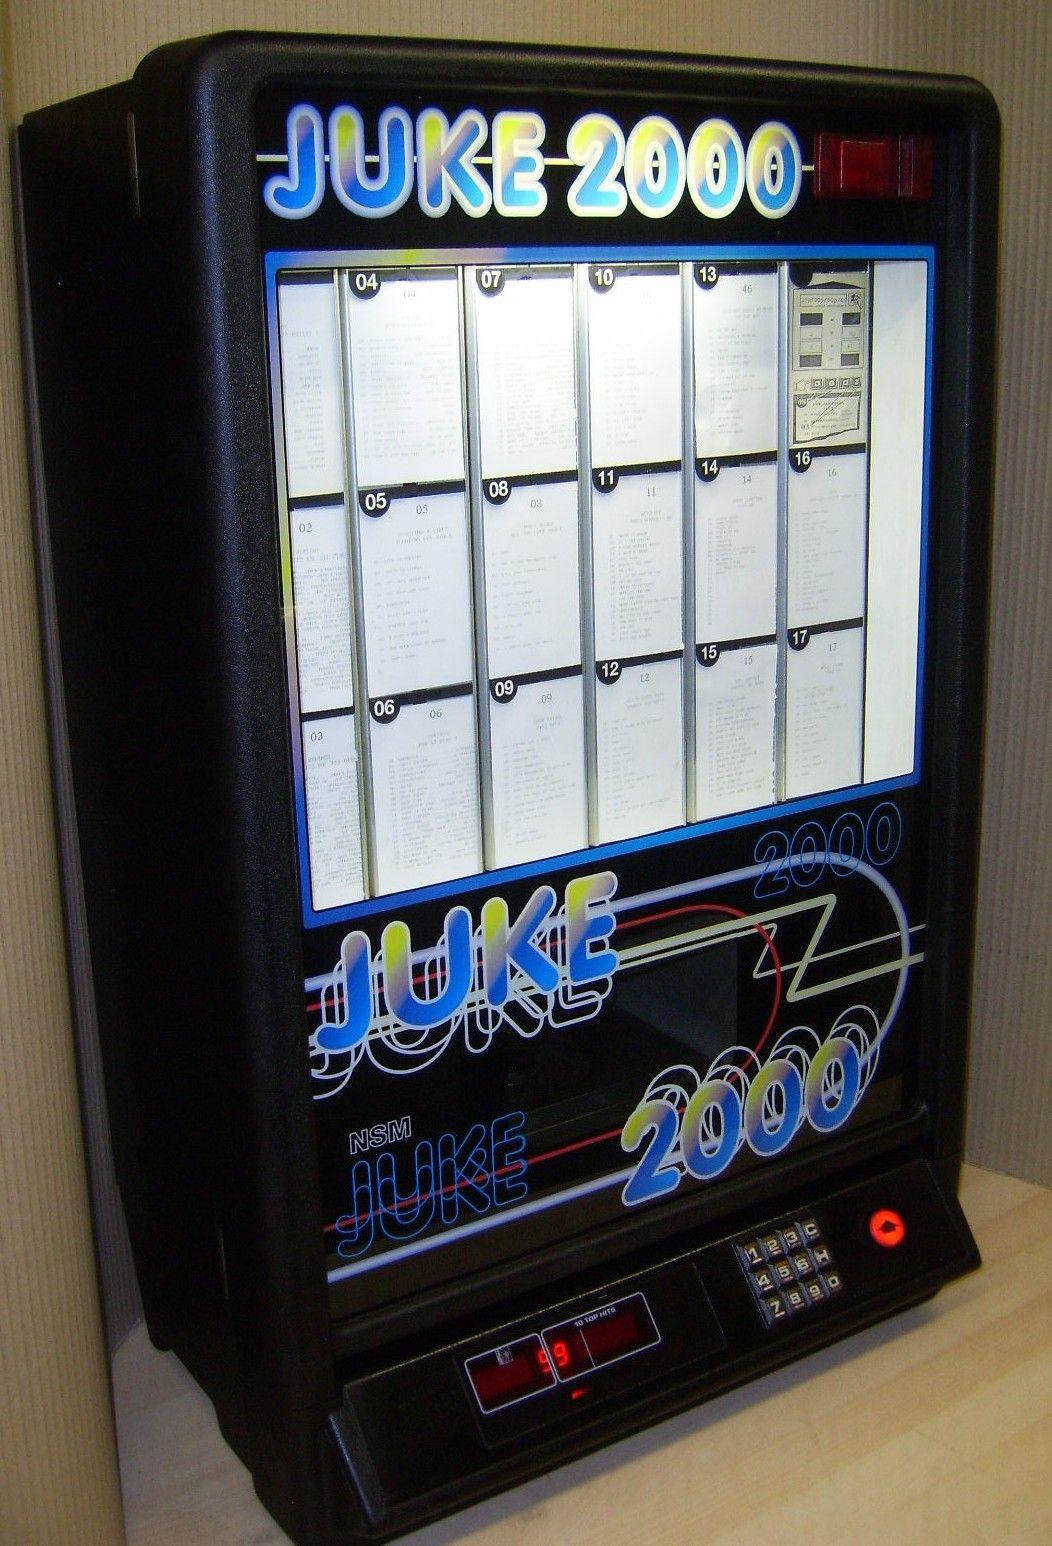 The Juke 2000 CD Jukebox.